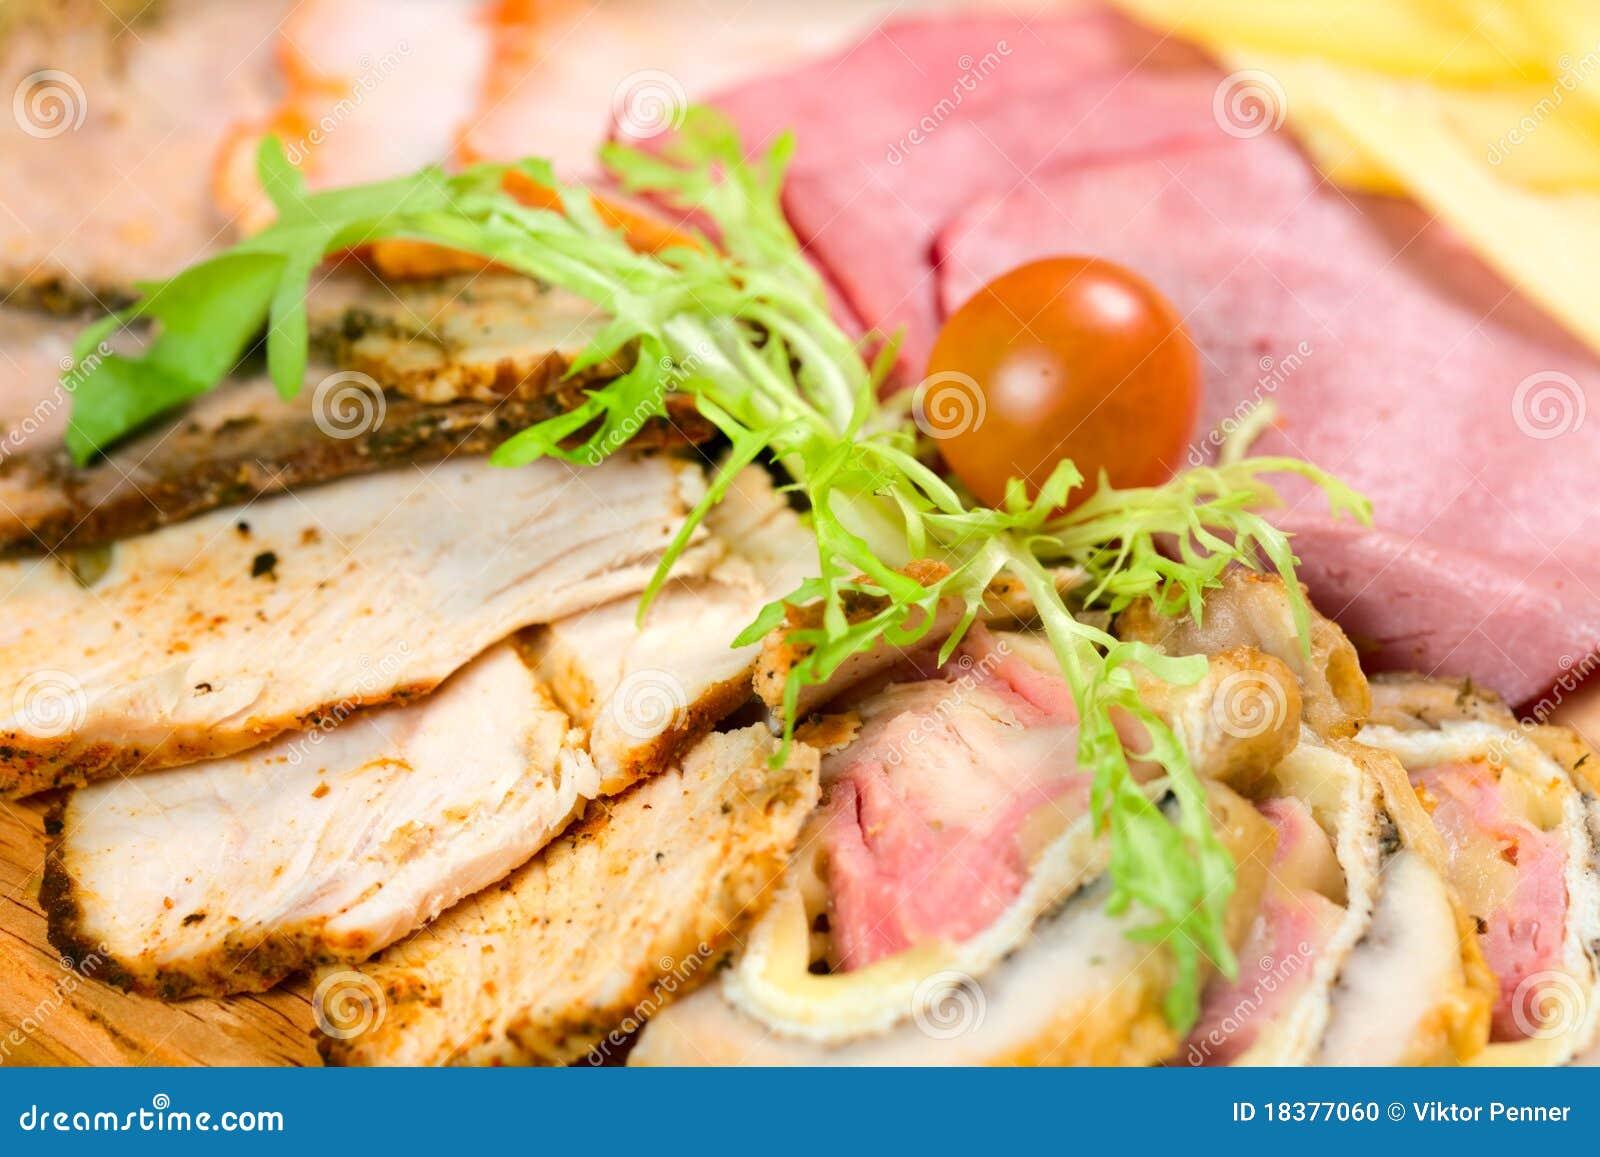 вылечено режущ мясо